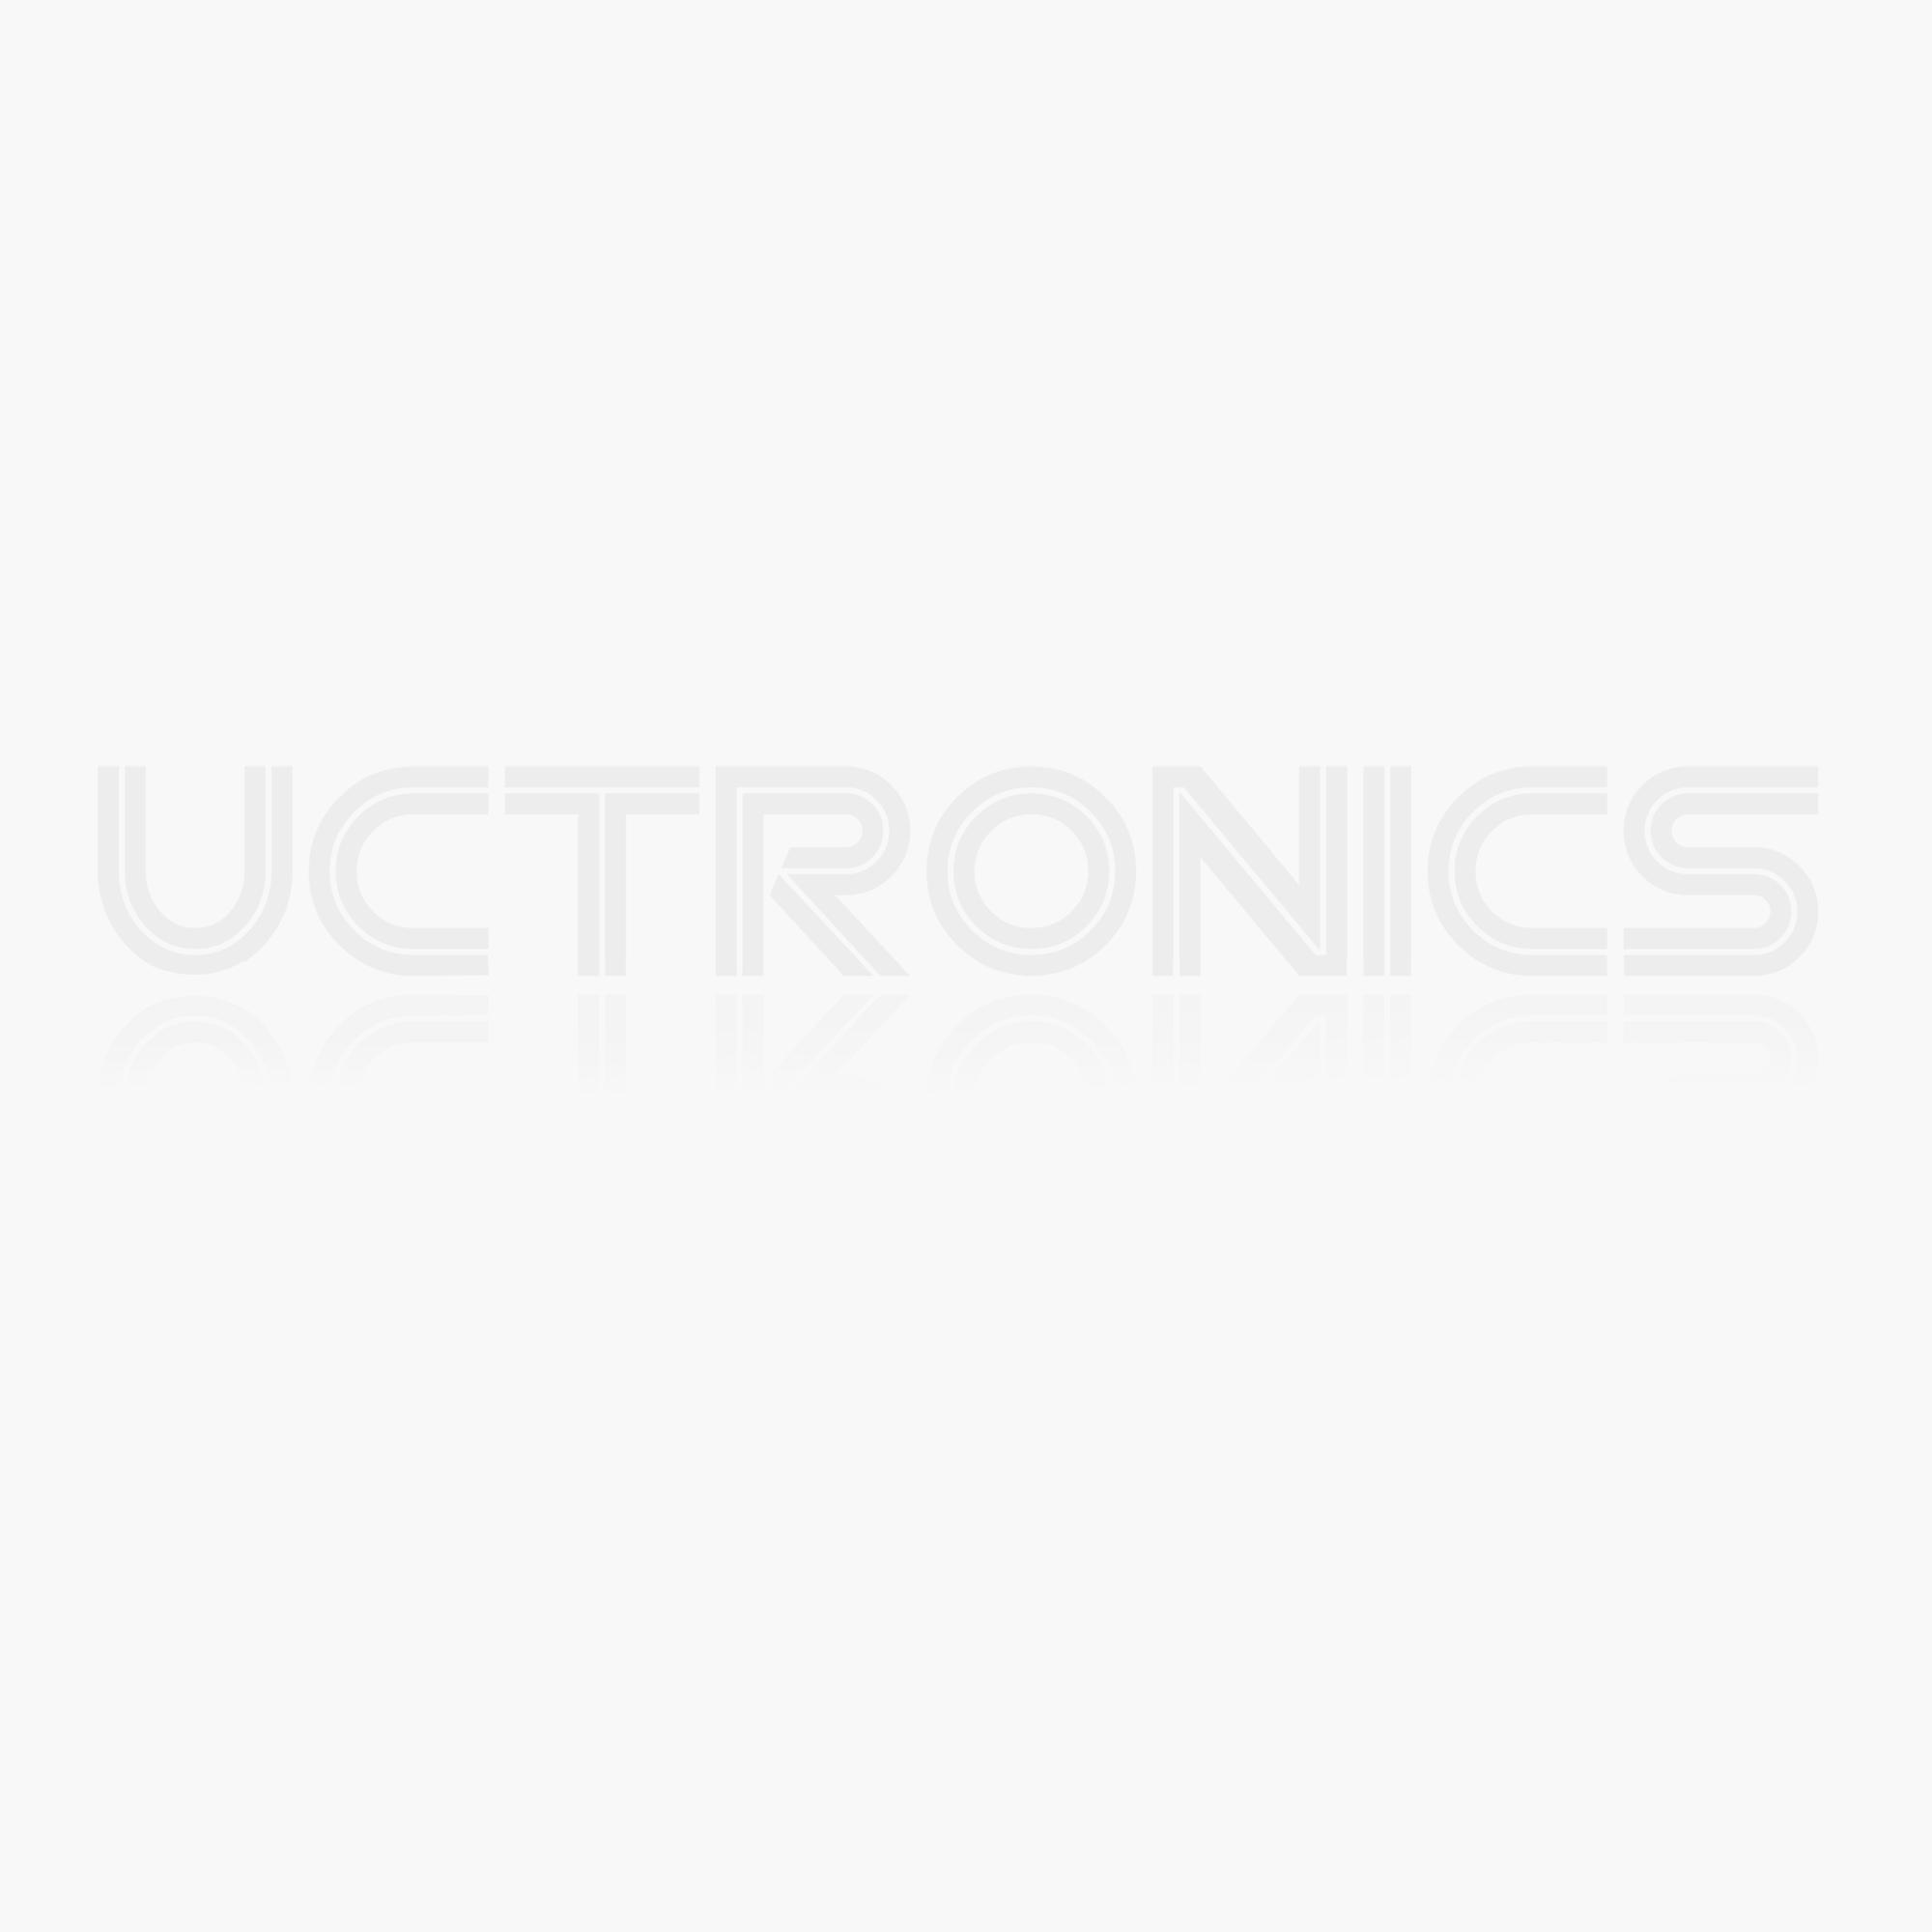 100pcs MK-12C02 7 Pin SMD 2 Position SPDT 1P2T mini Vertical Slide Switch